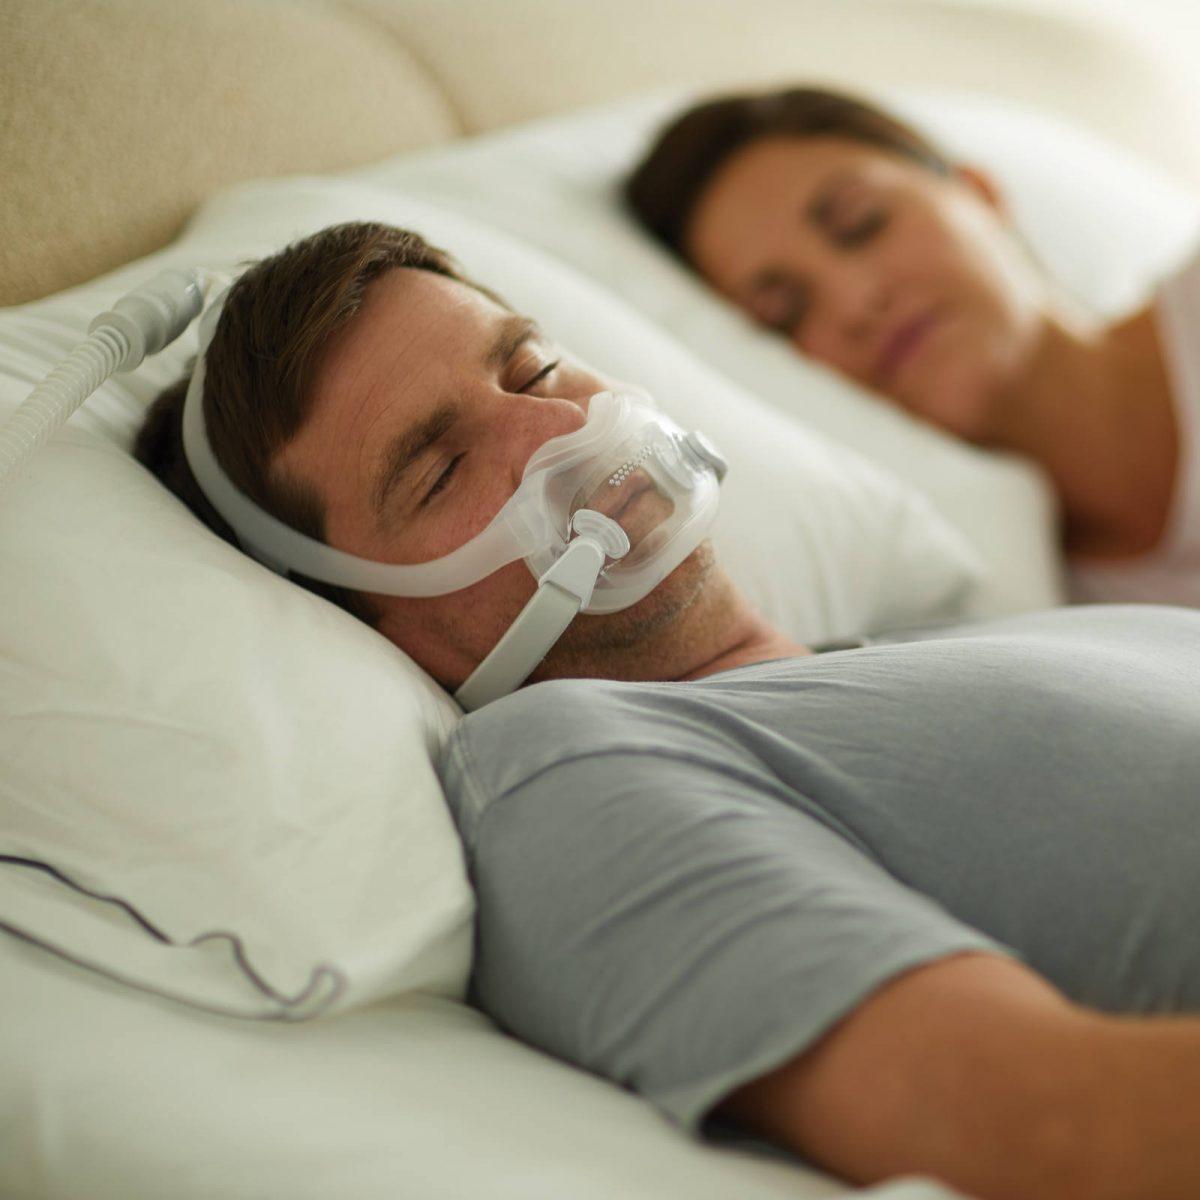 DreamWear Full Face CPAP Mask - single size